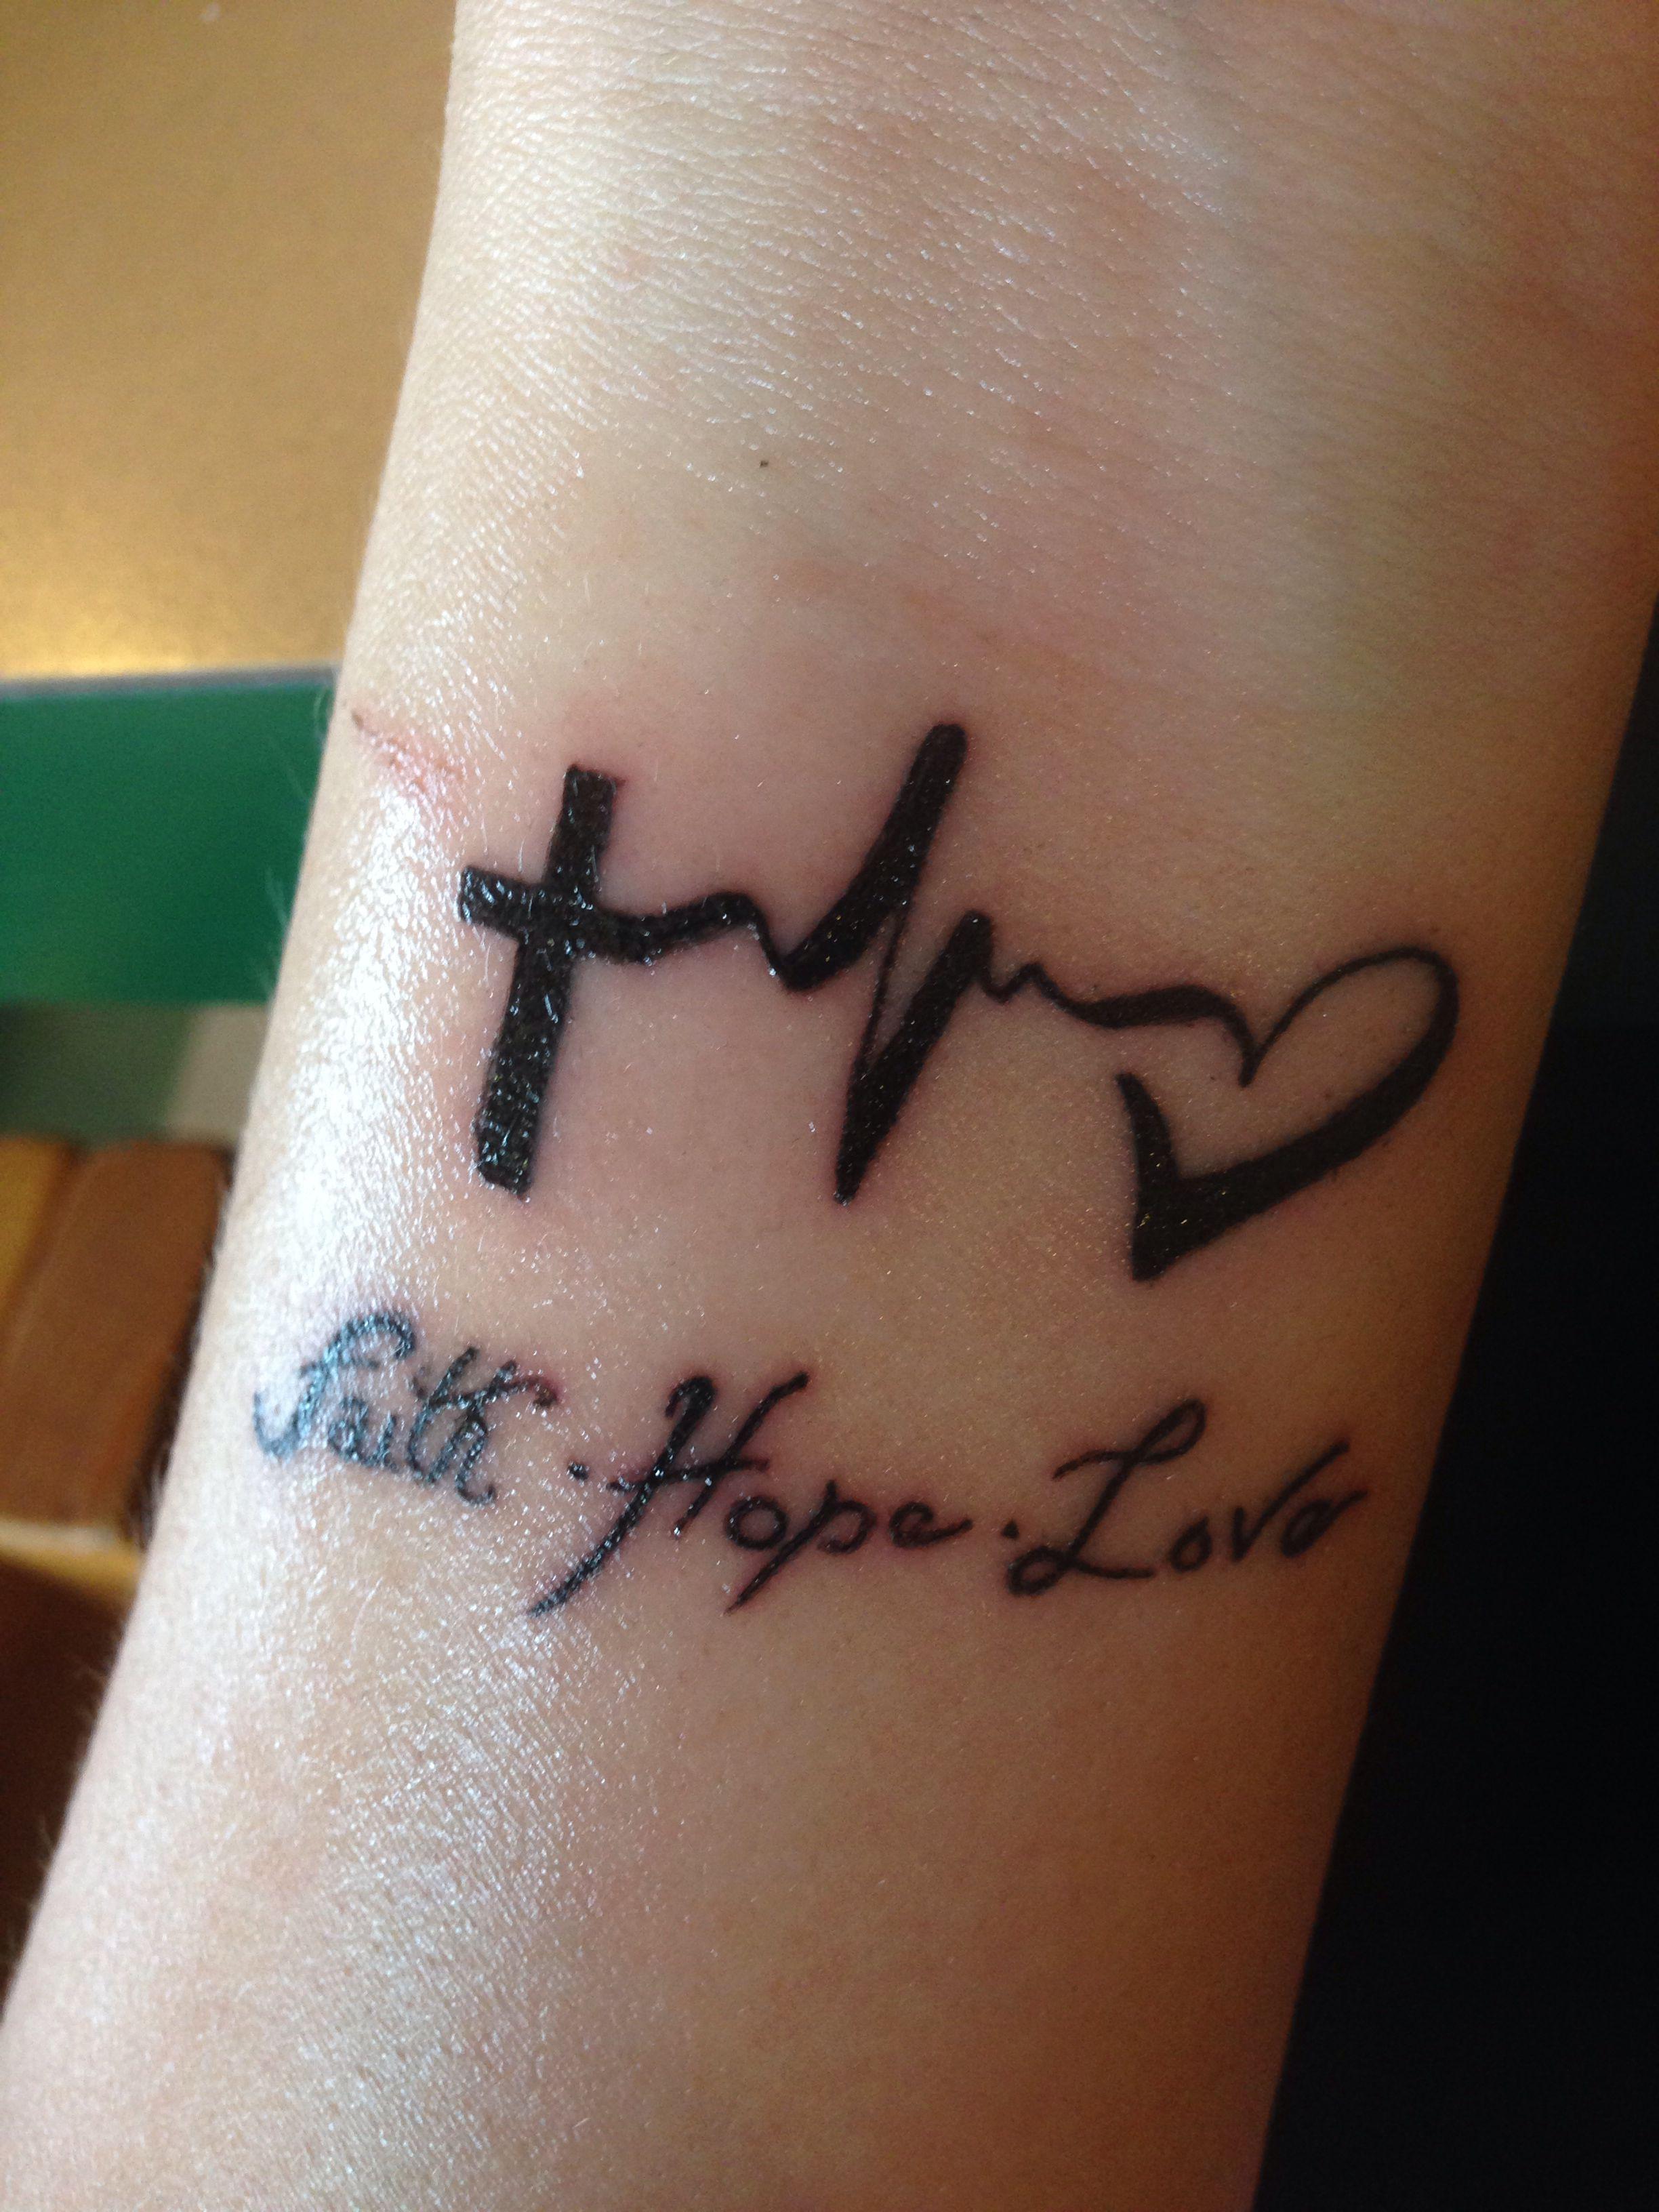 Wrist tattoo faith hope love. Faith tattoo on wrist